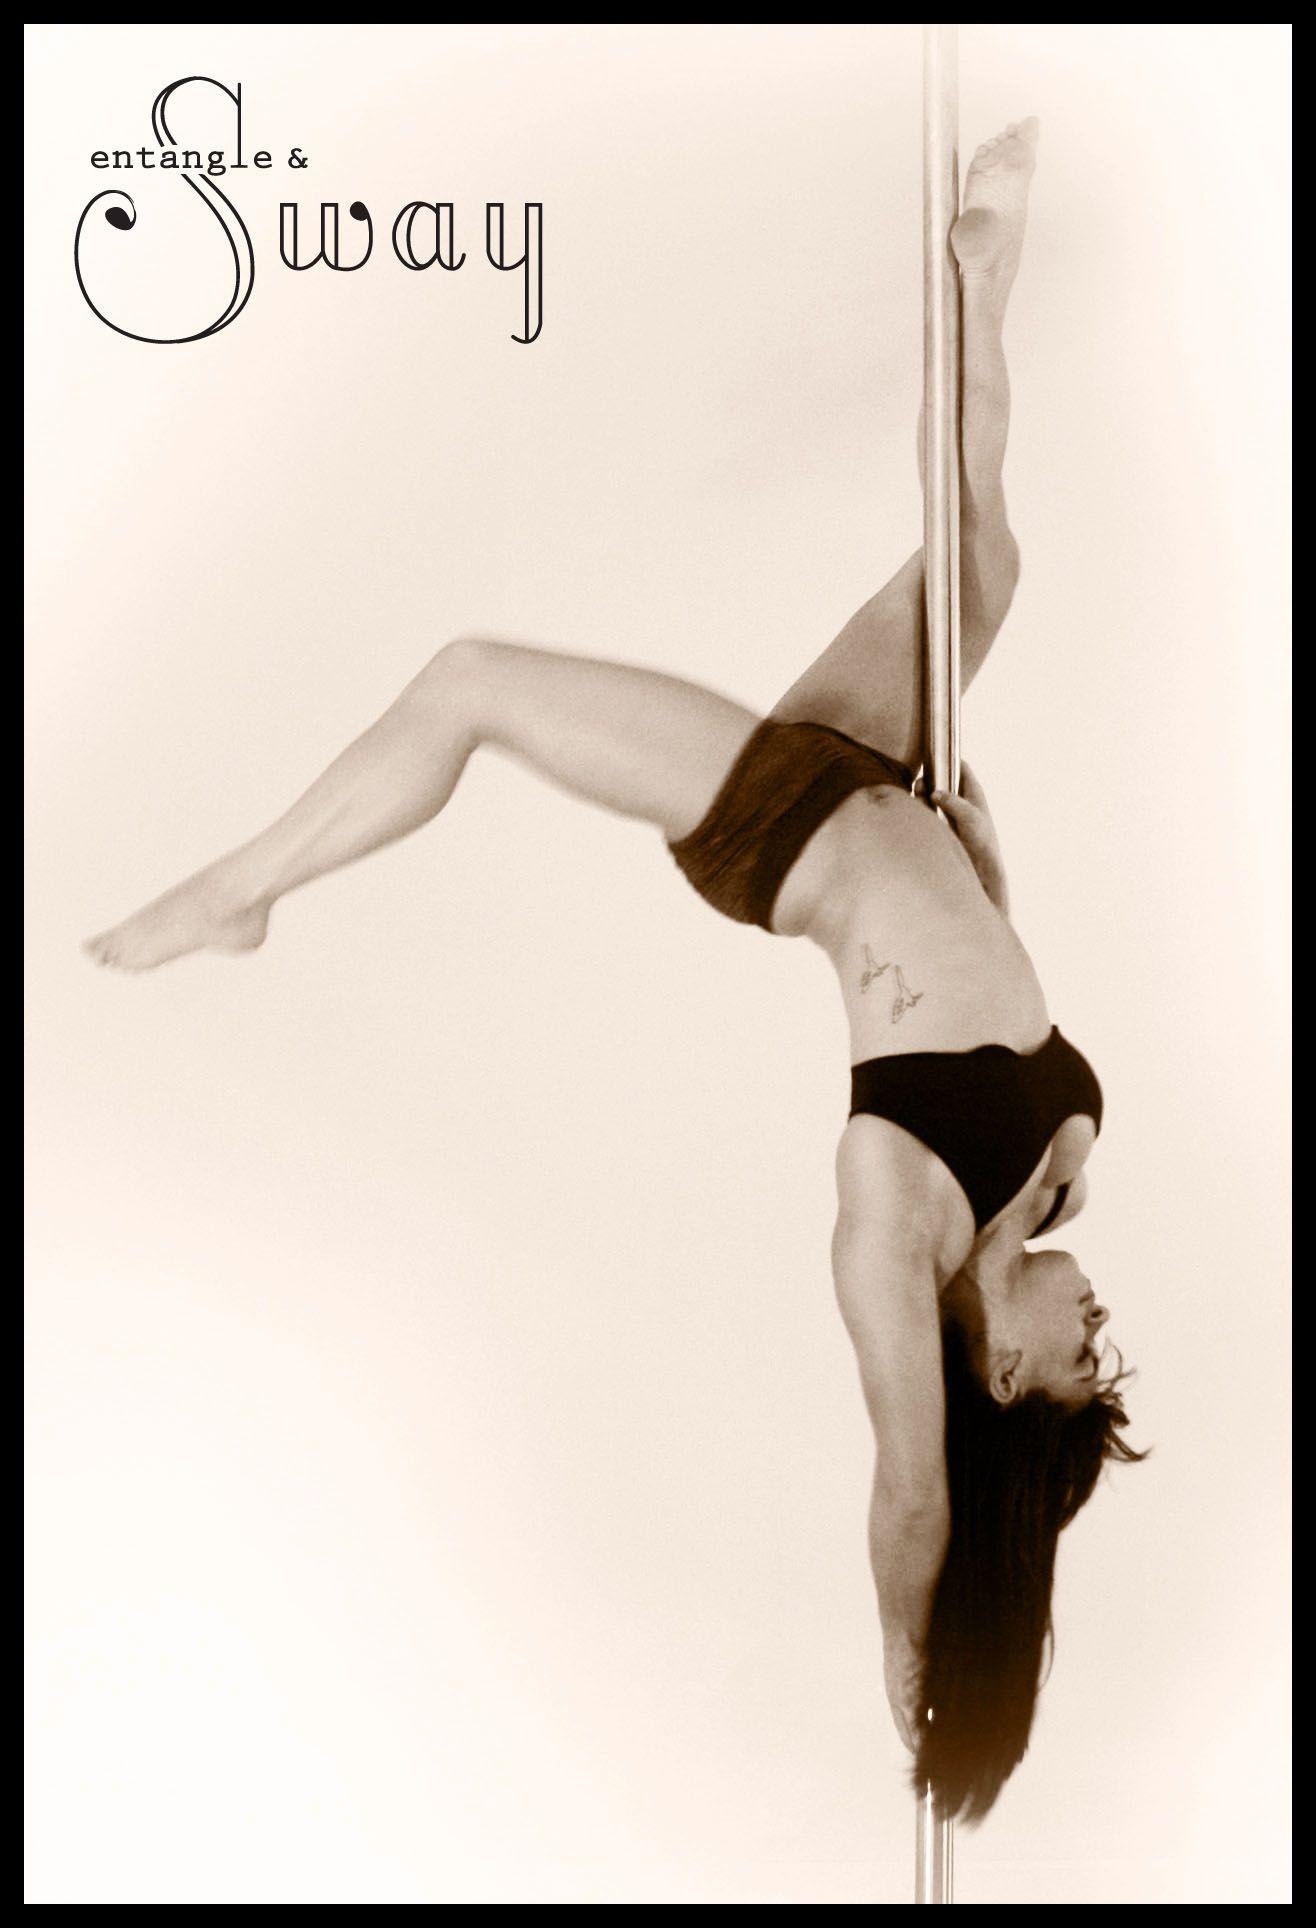 inside knee hang pole move entangle sway pole dance fitness